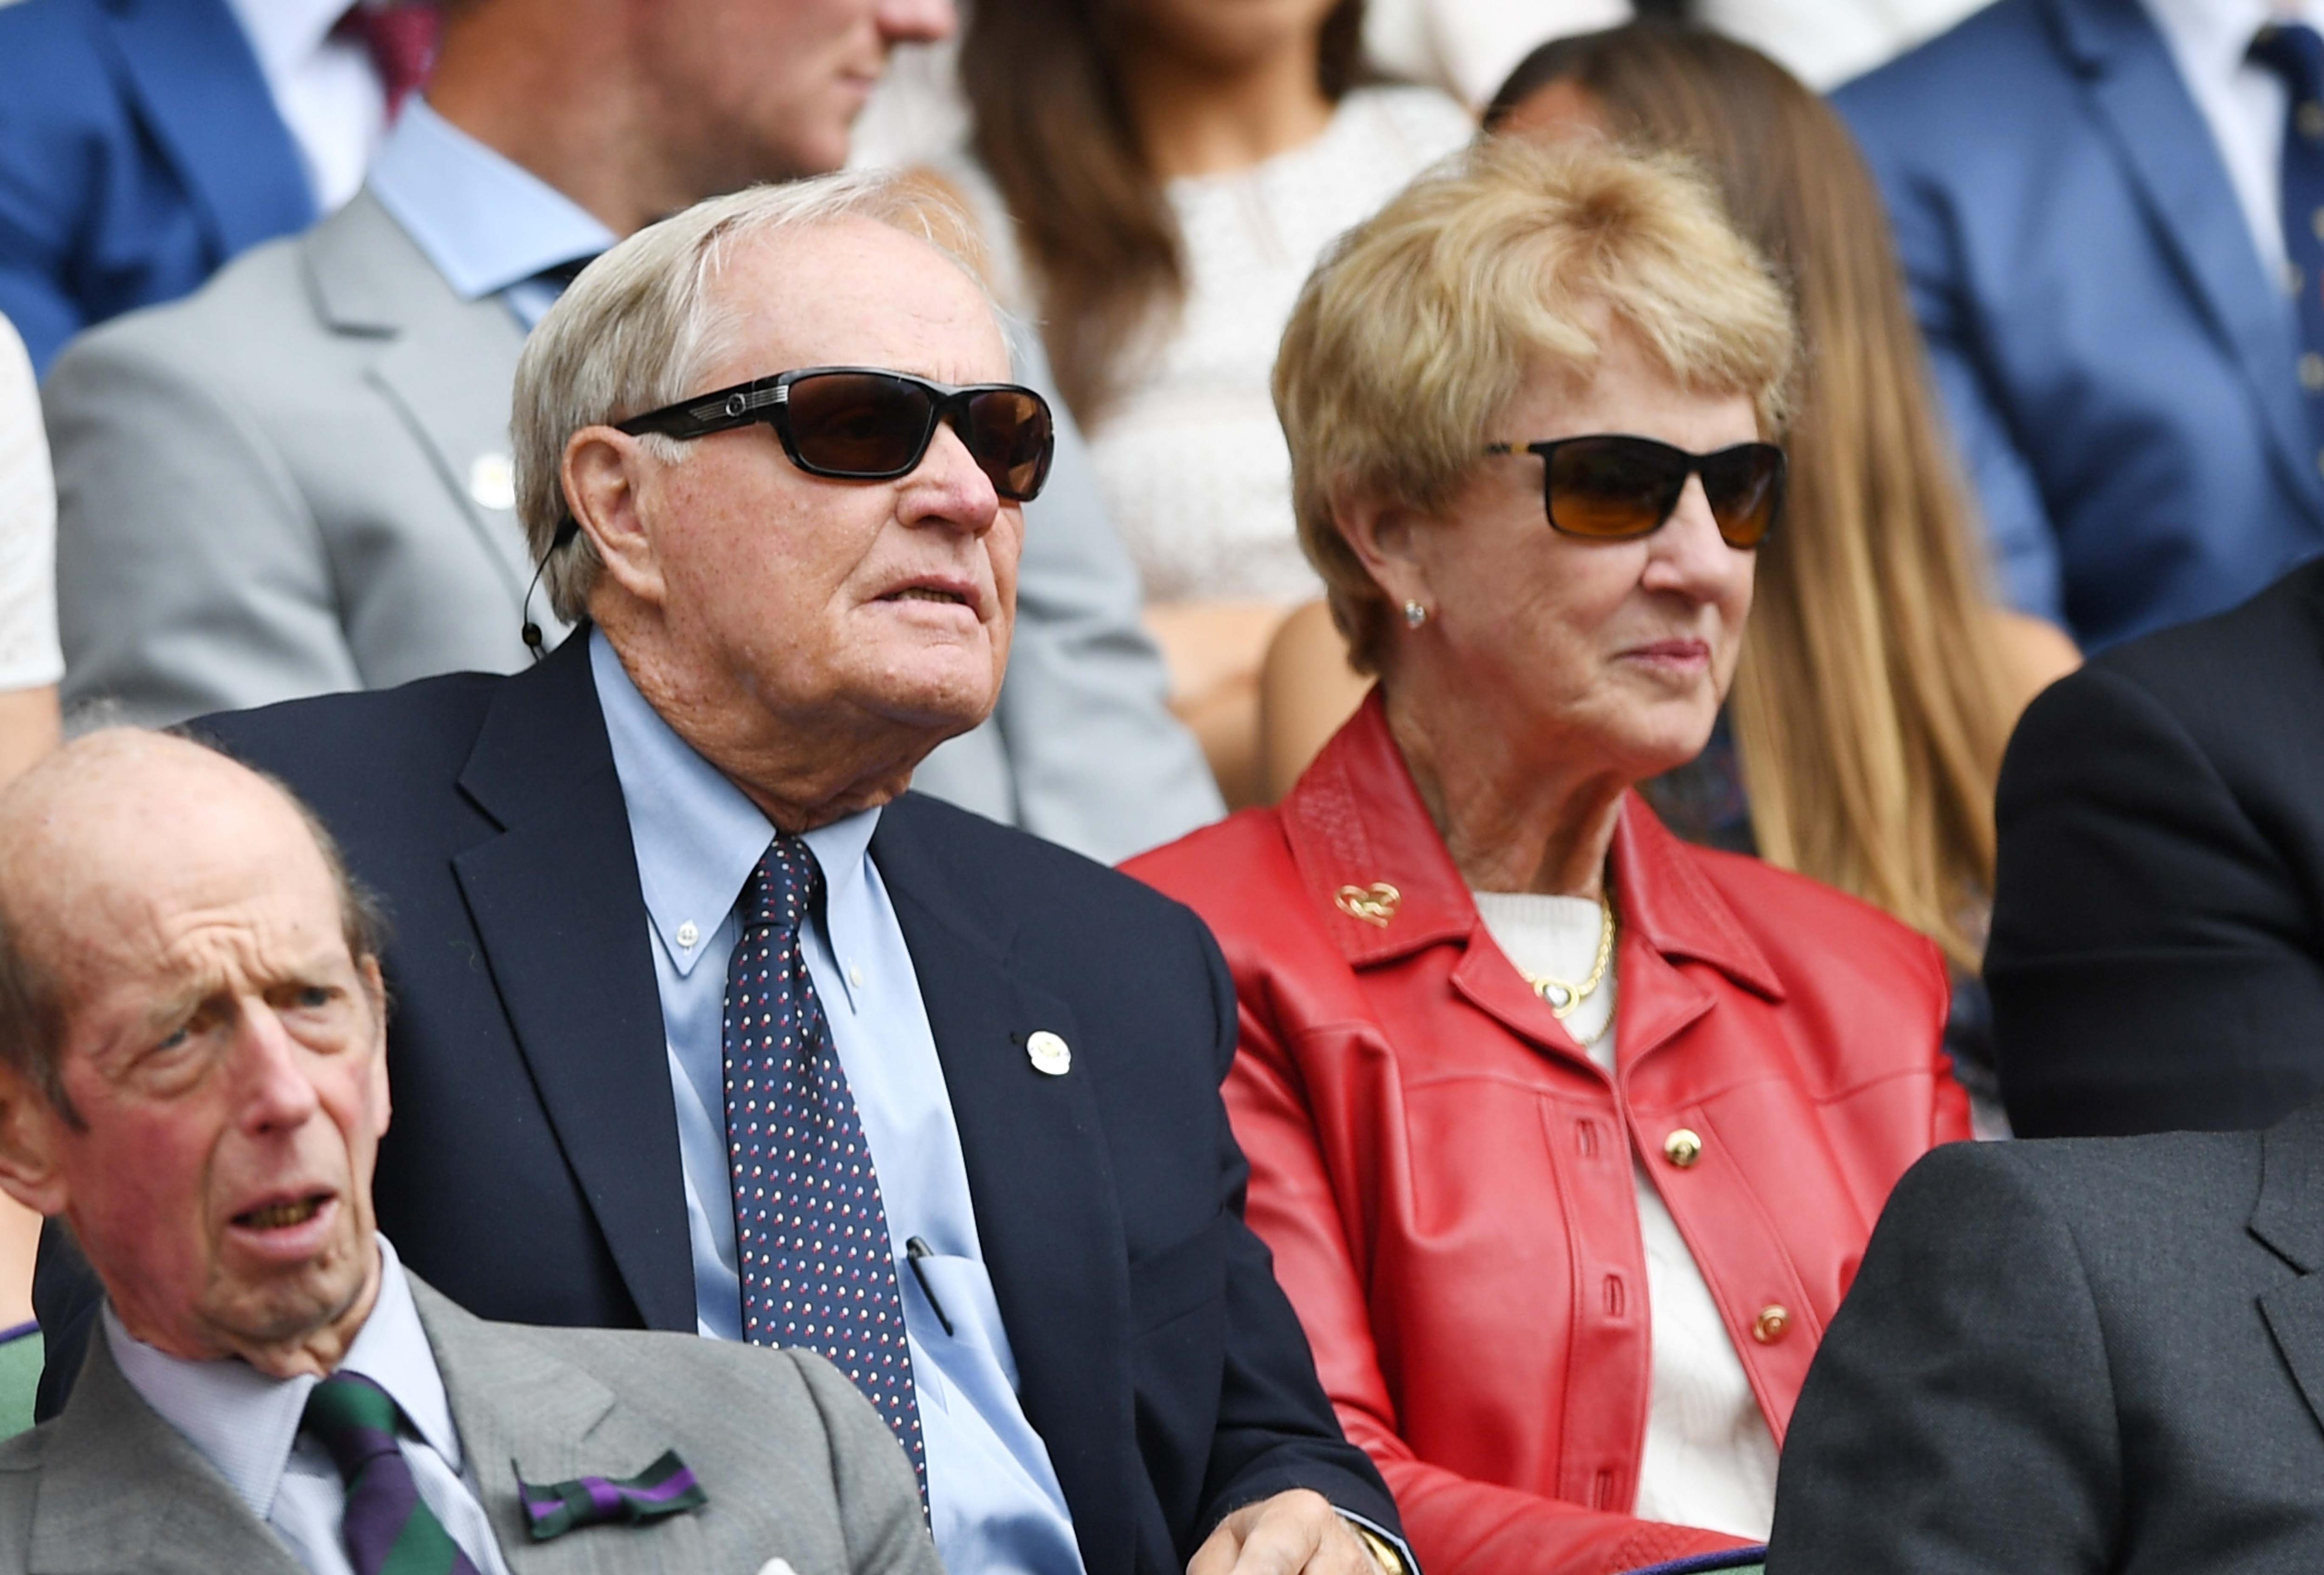 Jack and Barbara Nicklaus